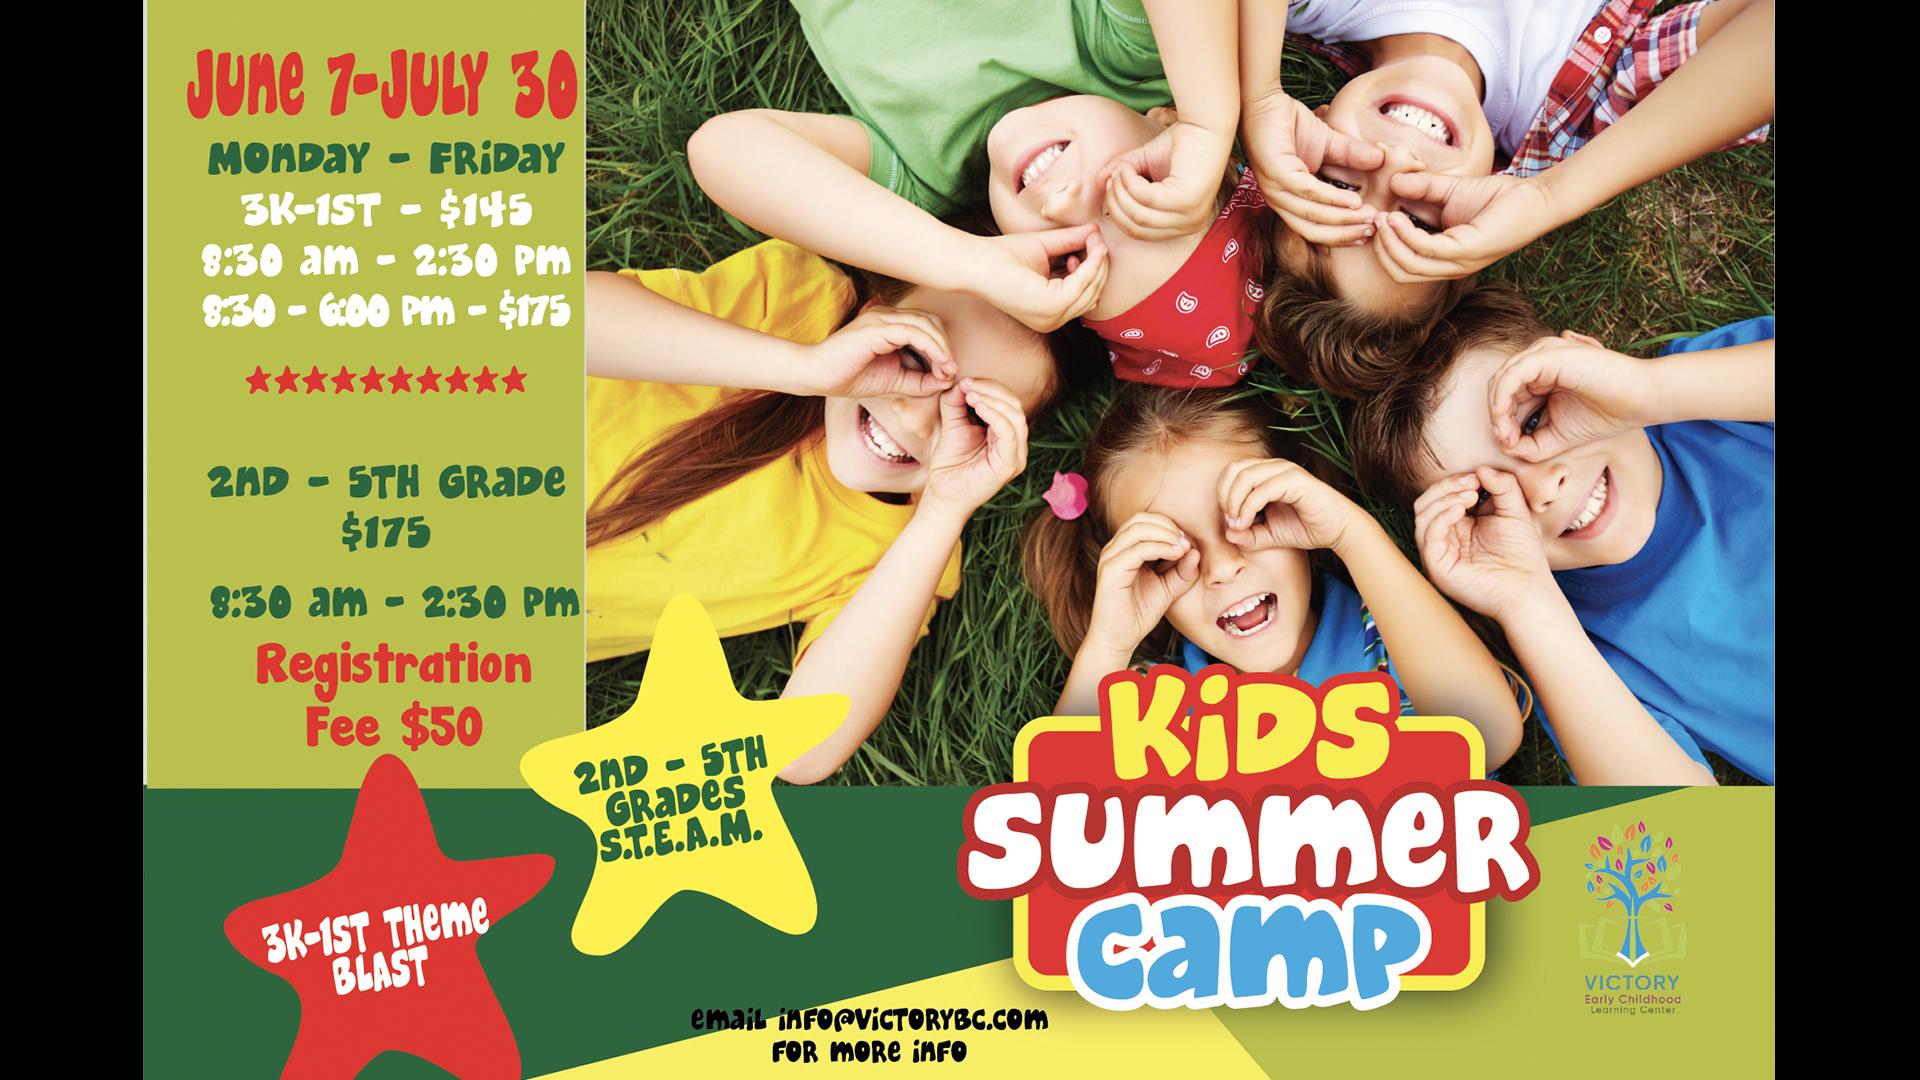 ECLC Summer Caamp